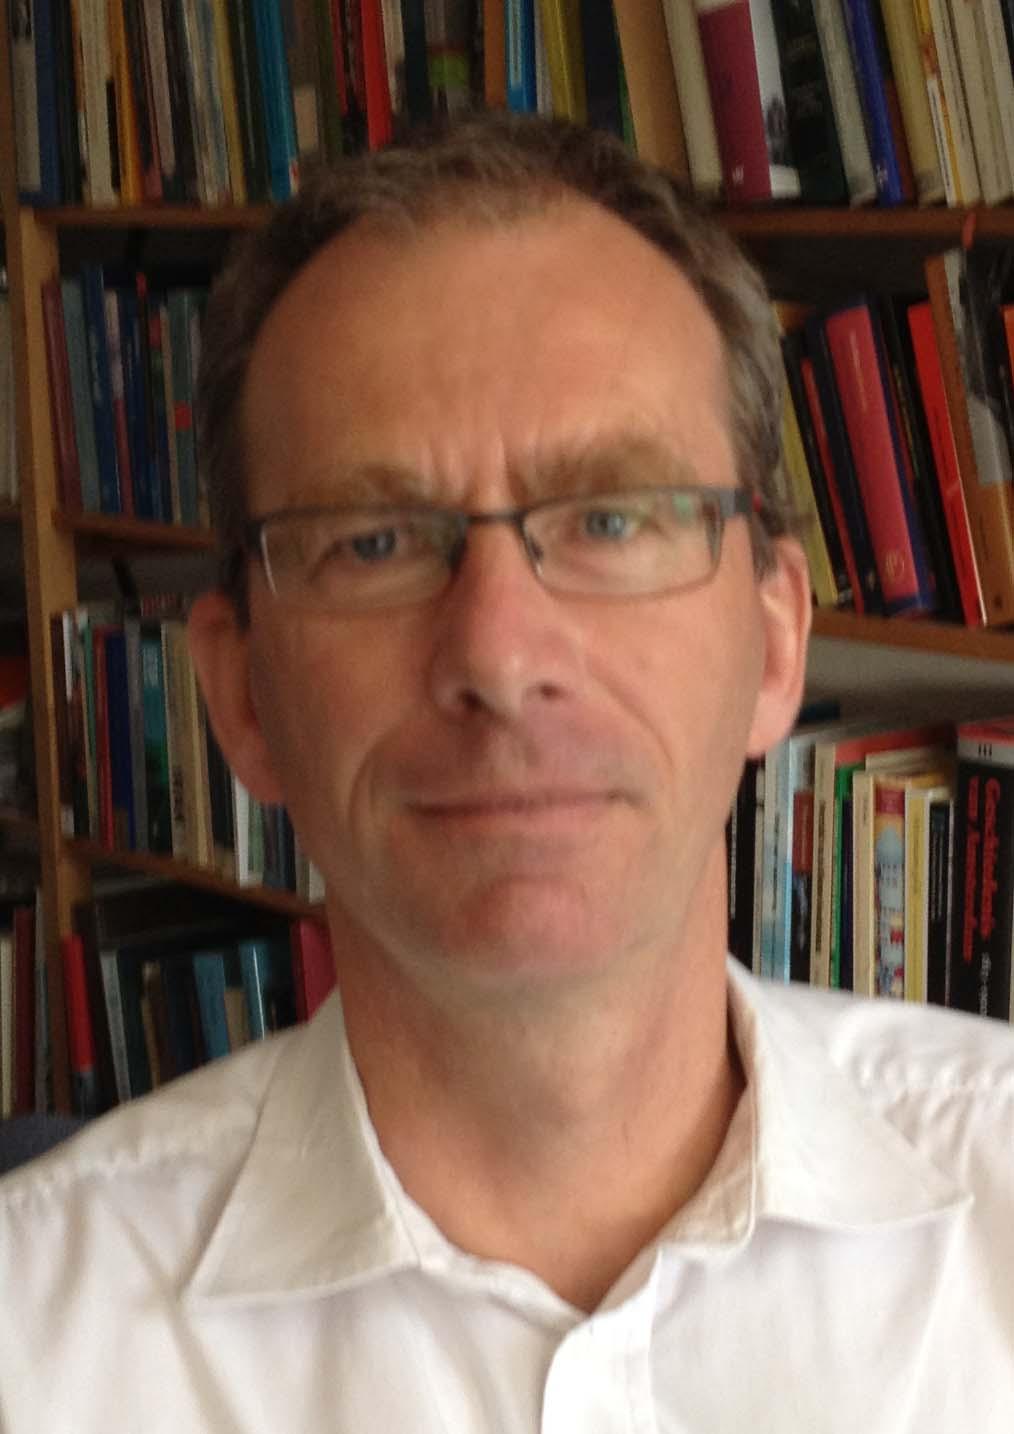 prof. dr. D.J. (Dirk Jan) Wolffram